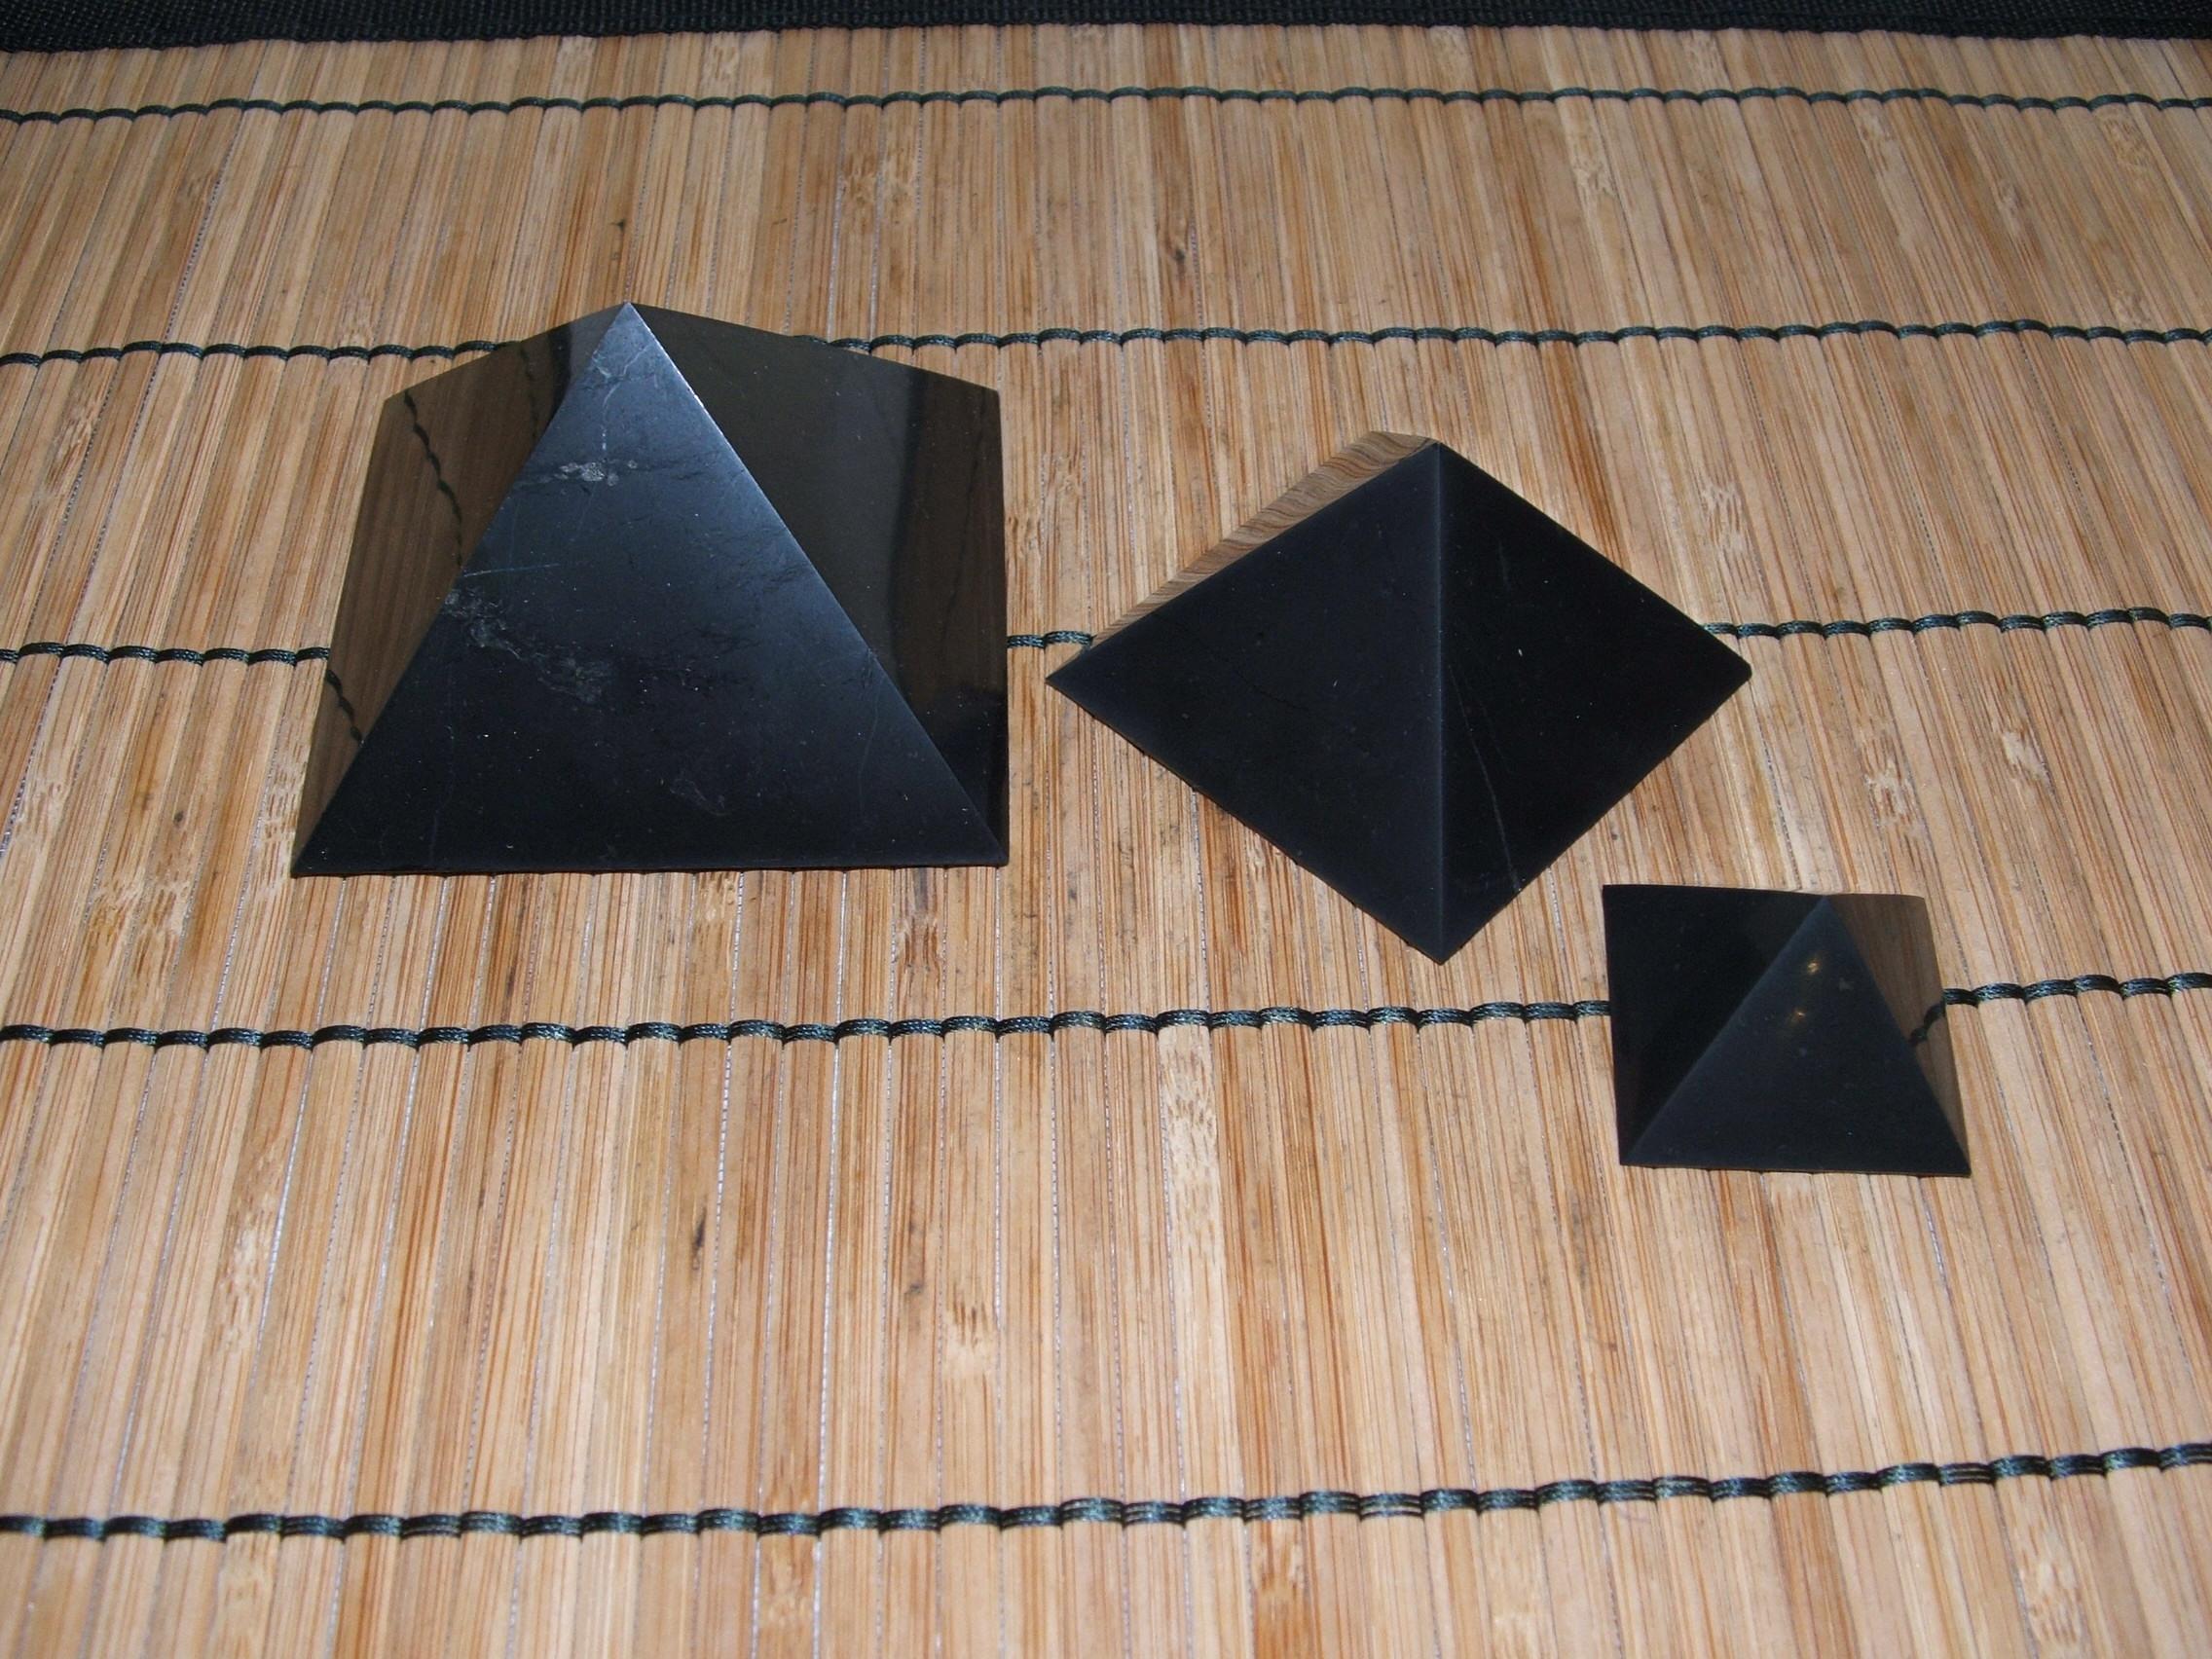 Пирамида для медитации своими руками